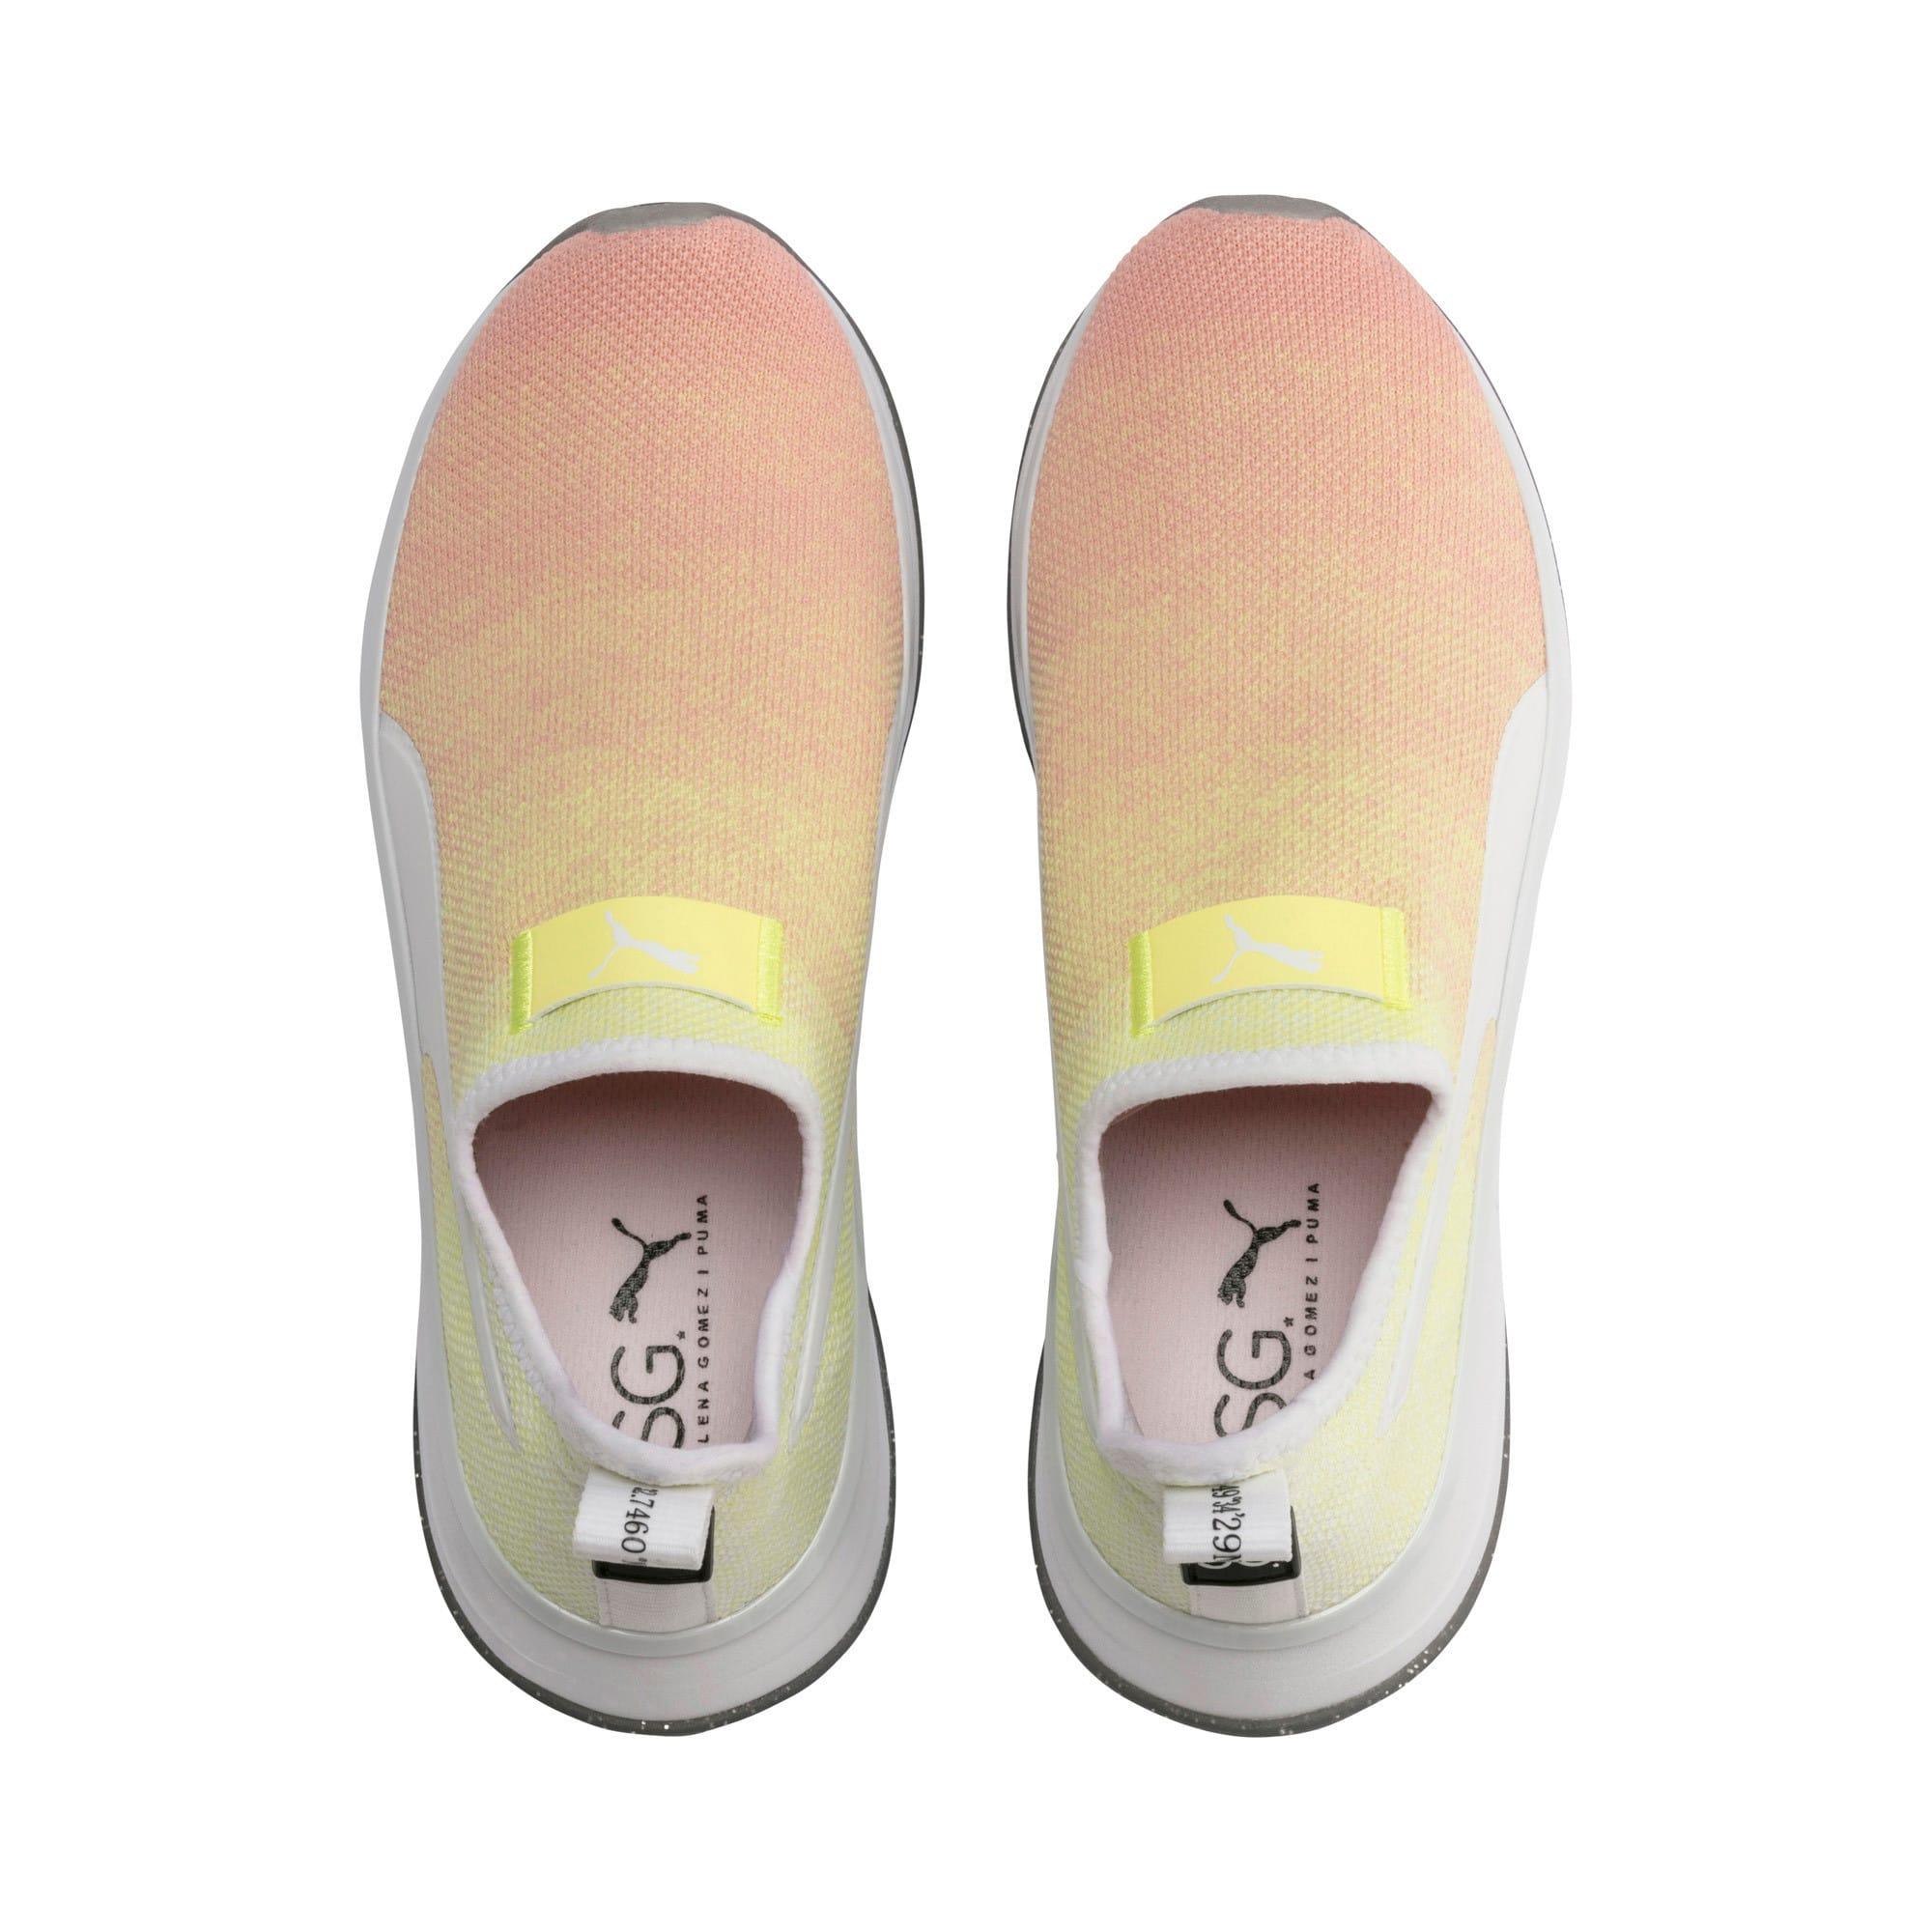 Thumbnail 7 of SG Slip-On Sunrise Women's Training Shoes, YELLOW-Peach Bud-White, medium